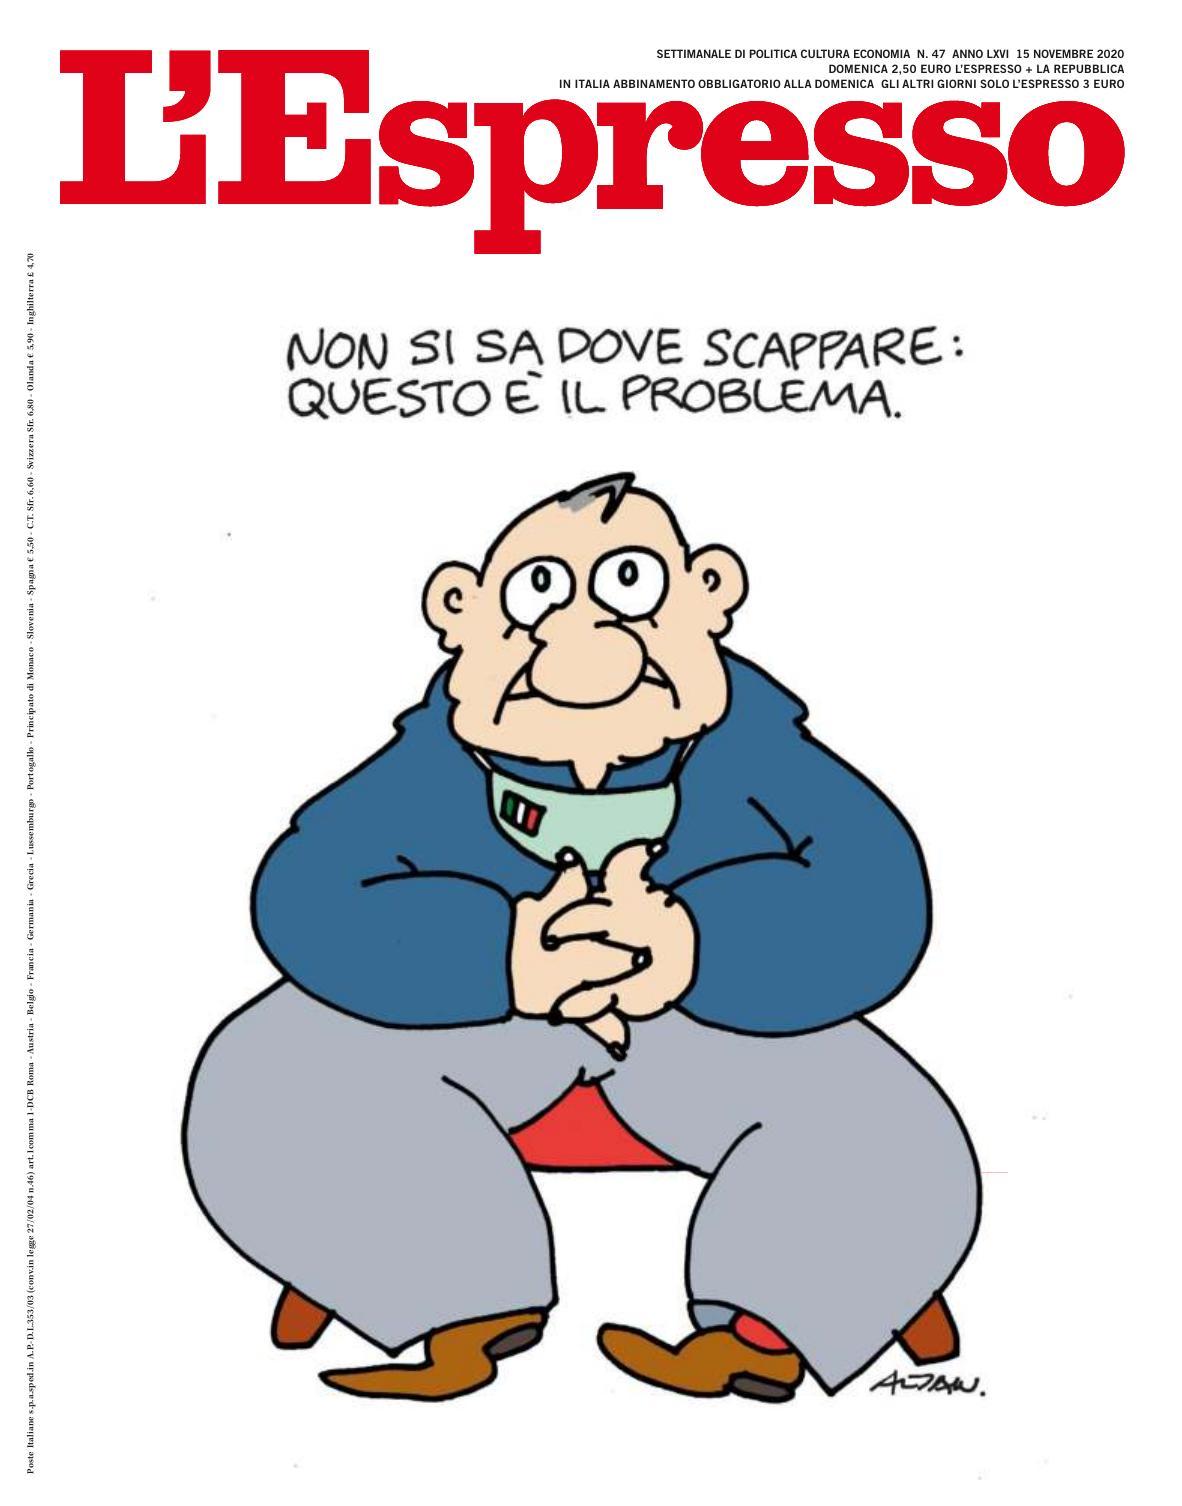 L'Espresso N.47 – 15 Novembre 2020